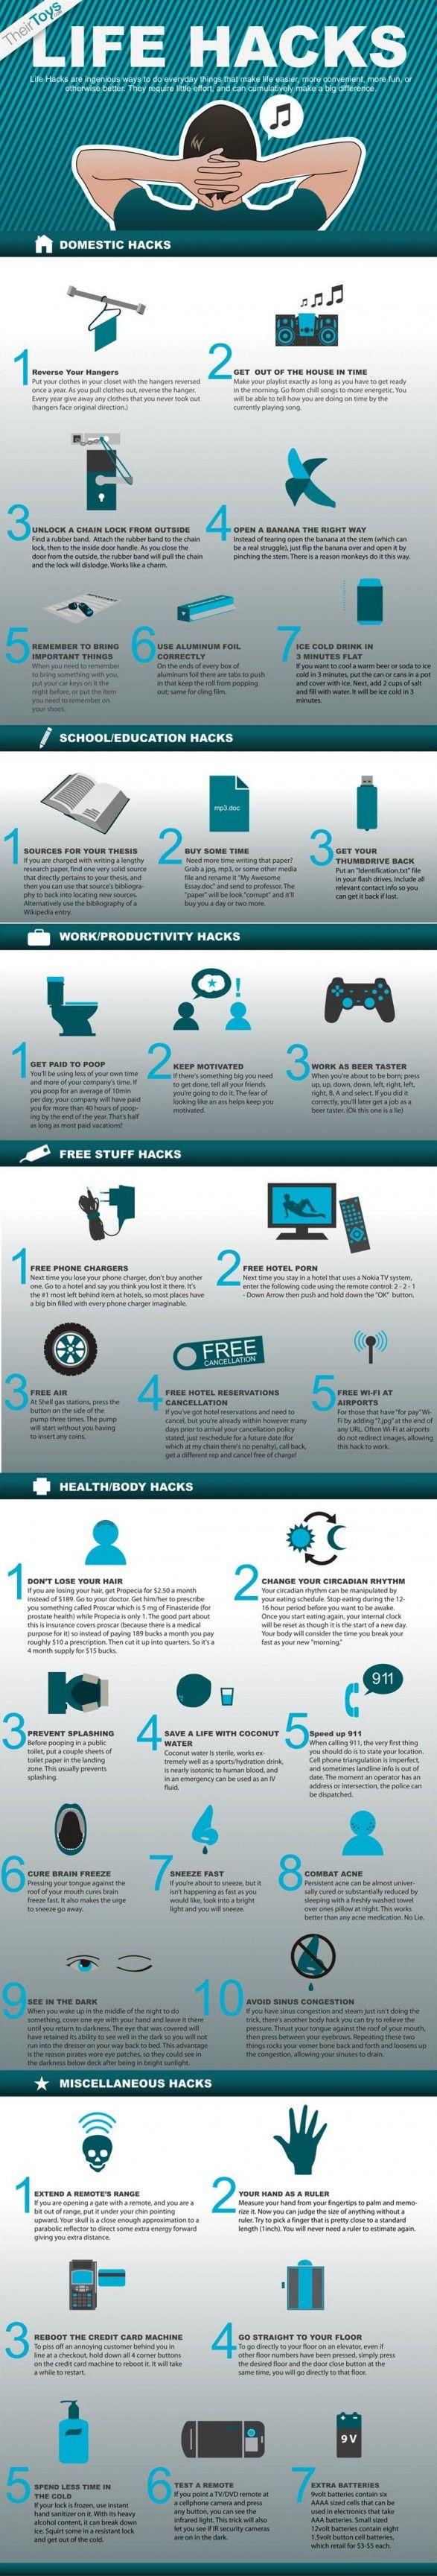 Life hacks. radIdeas,  Internet Site, Make Life Easier,  Website, Web Site, Life Tips, Using Life Hacks, Lifehacks, Life Cheat